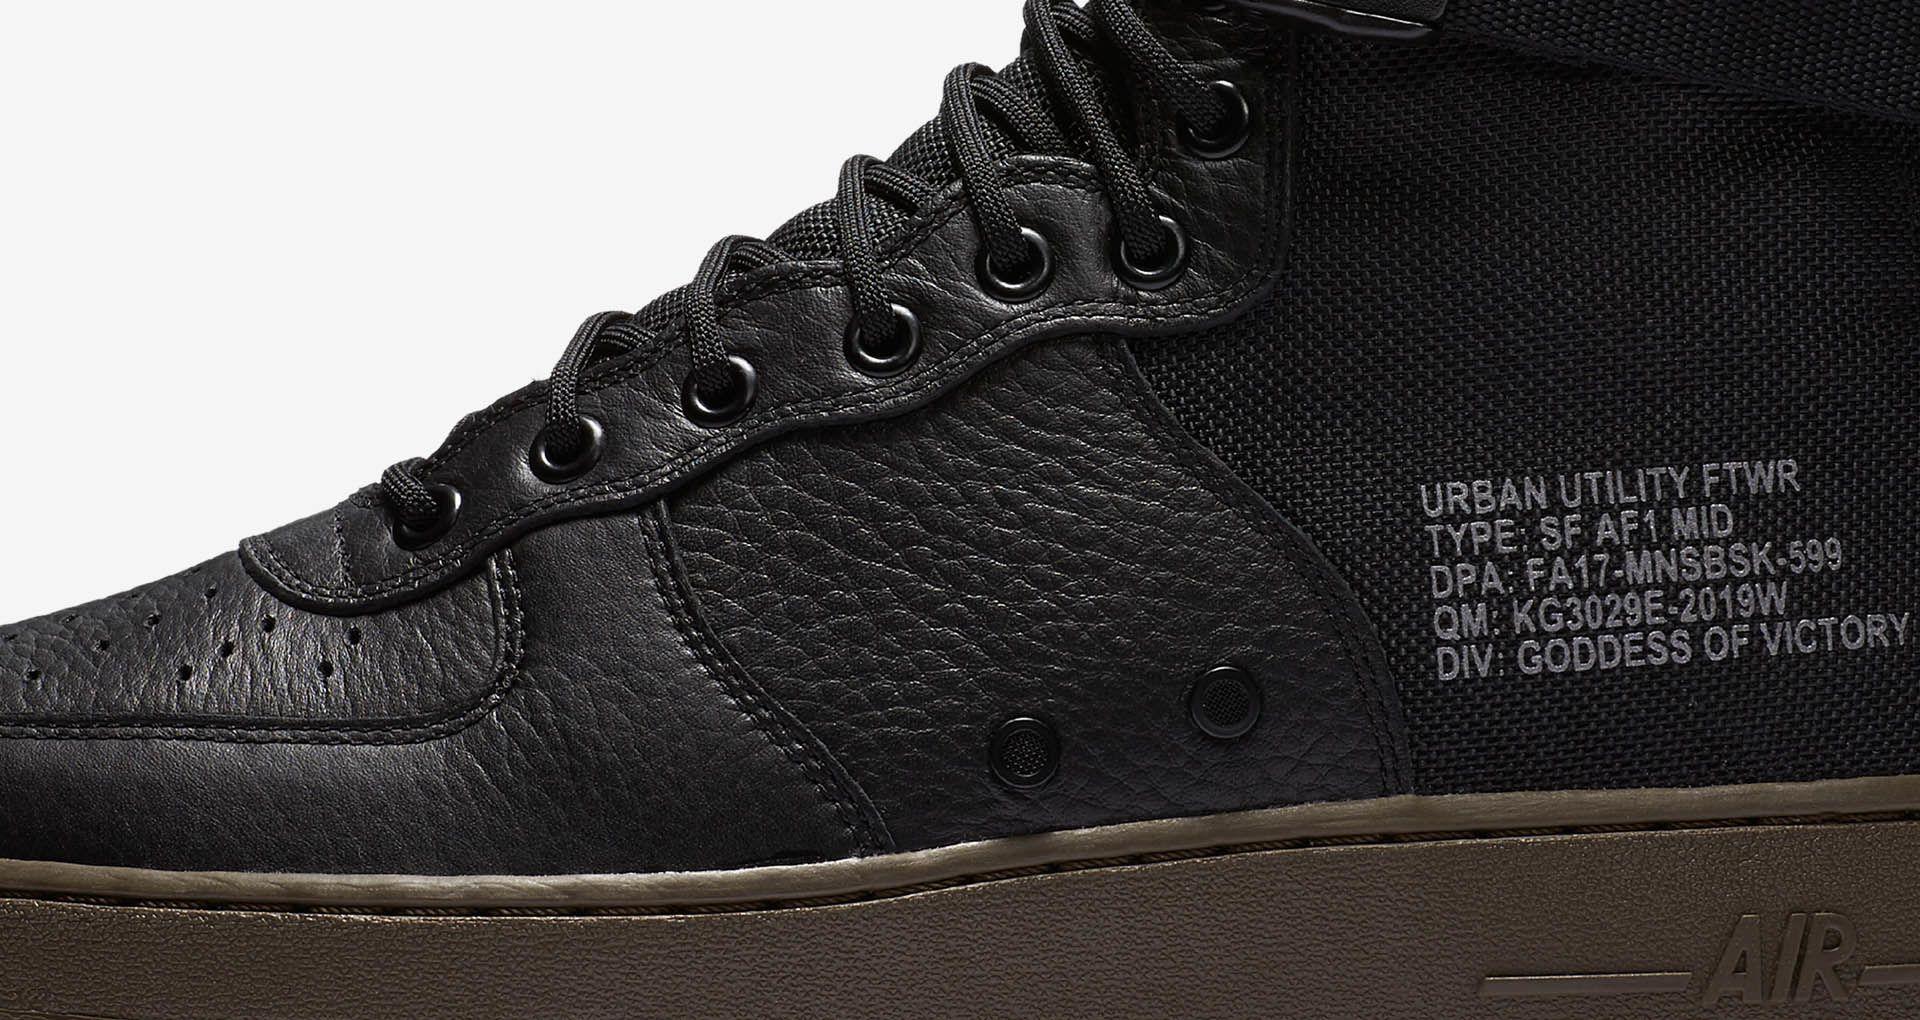 Nike SF AF 1 Mid 'Black & Dark Hazel'. Nike SNEAKRS SE